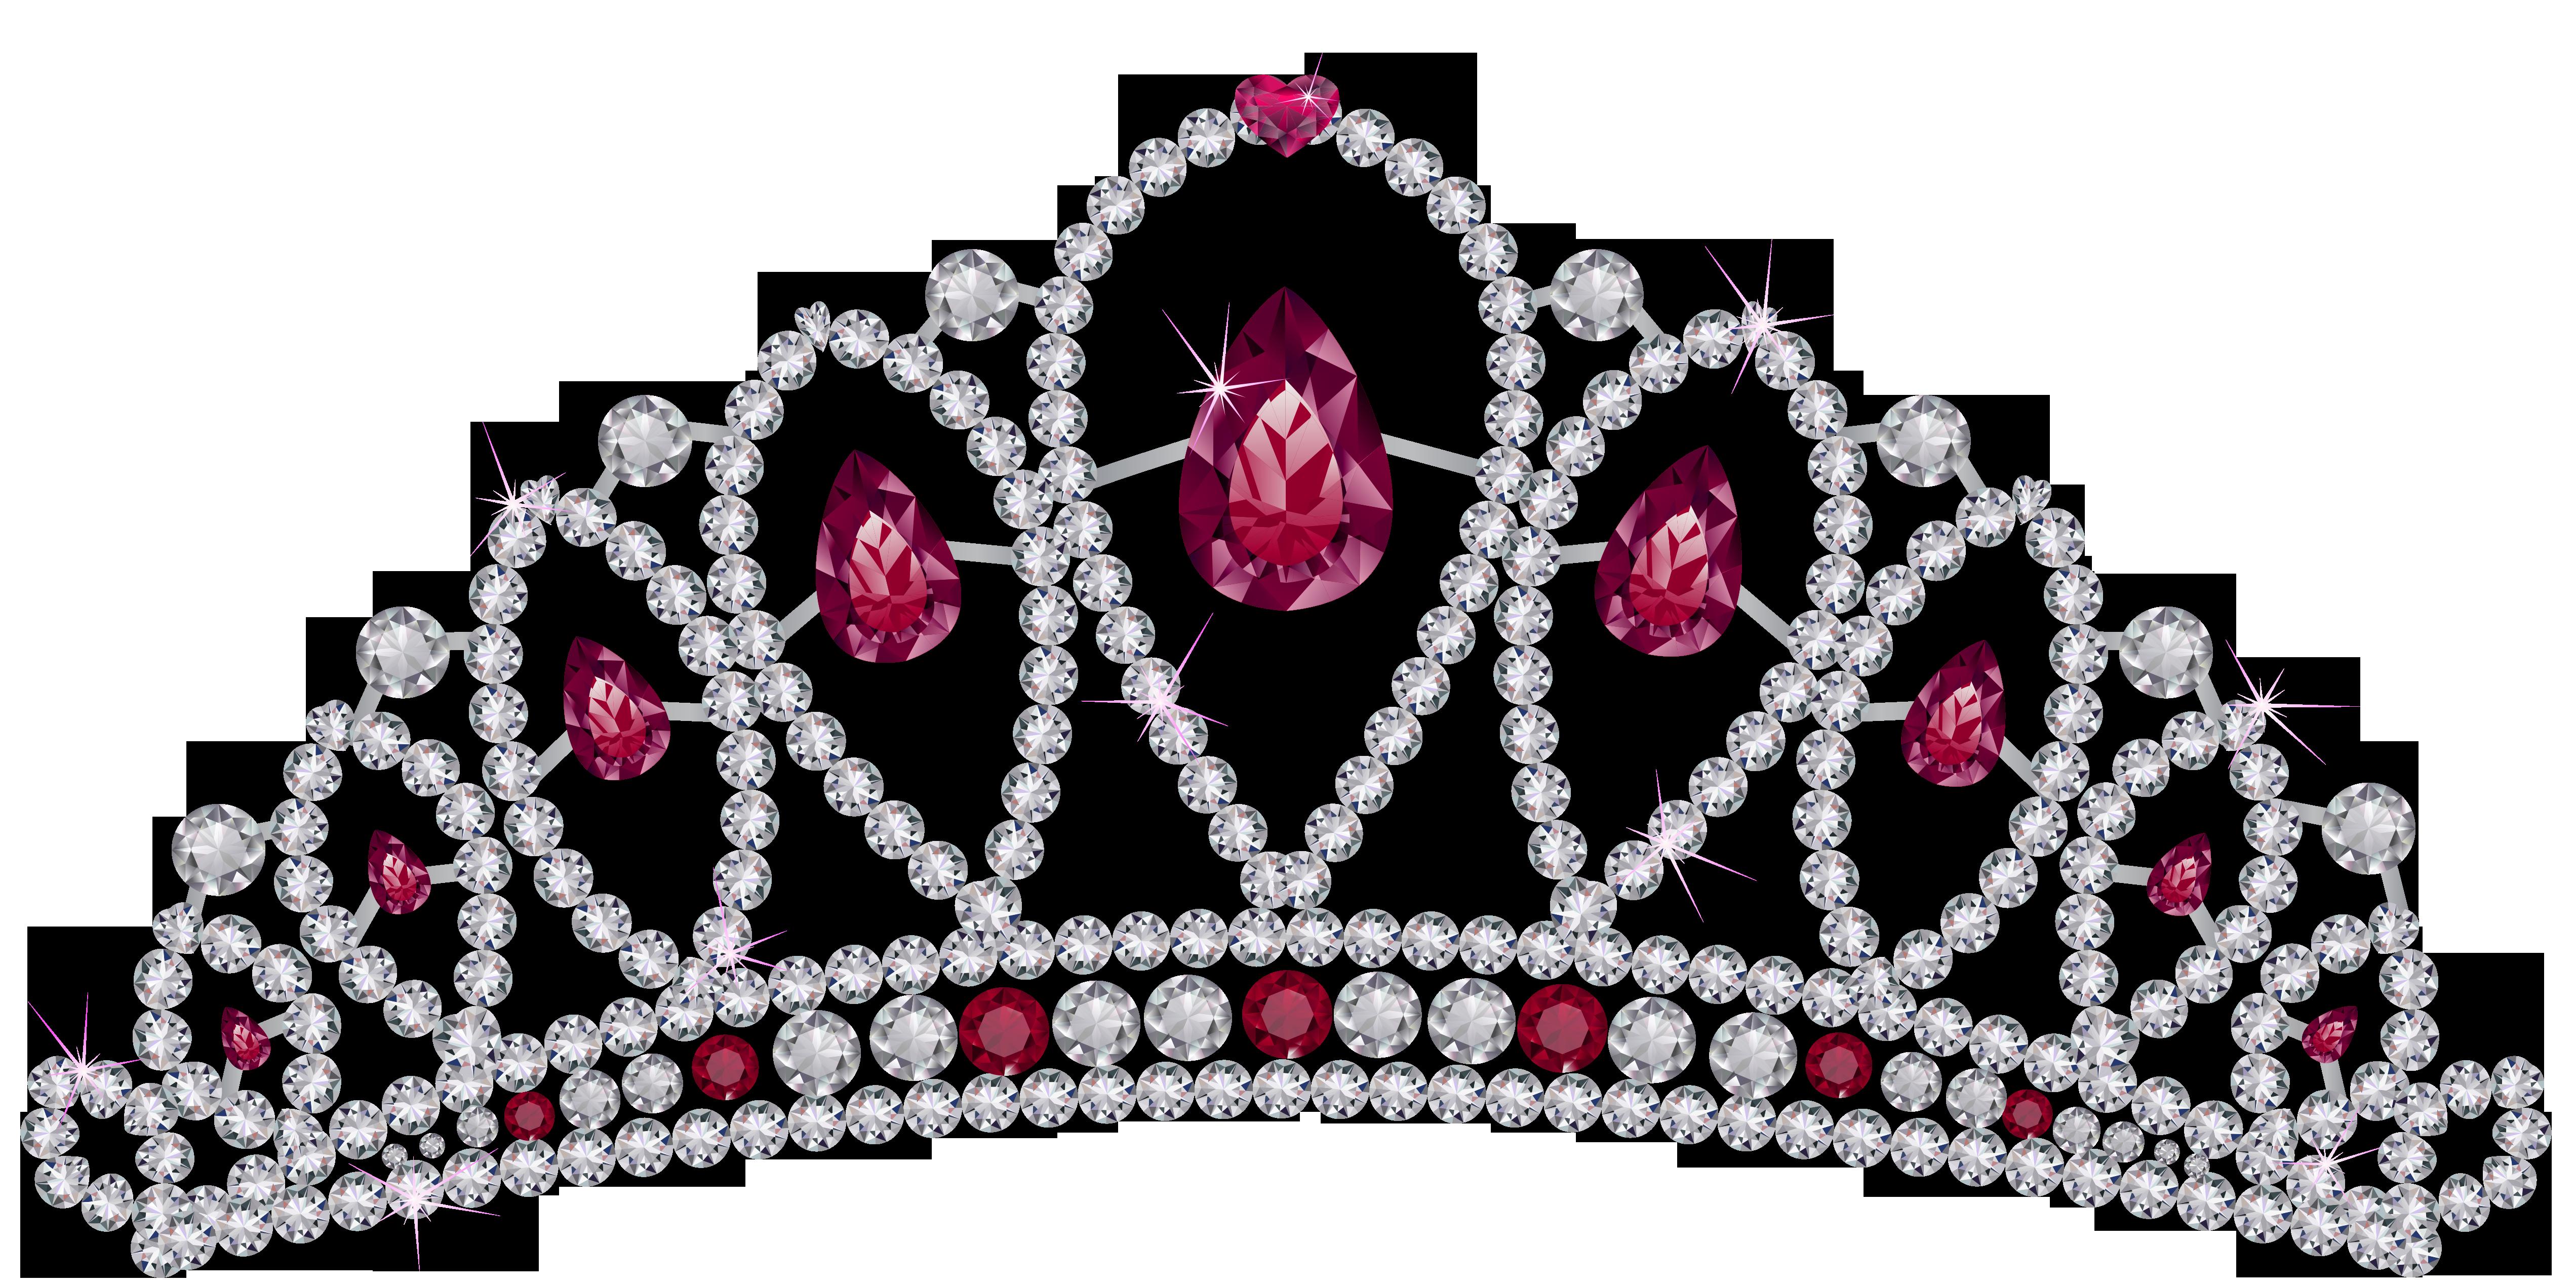 Tiara clipart transparent background clip art free download Diamond Crown Maximus Arturo Fuente - Diamond Tiara with ... clip art free download